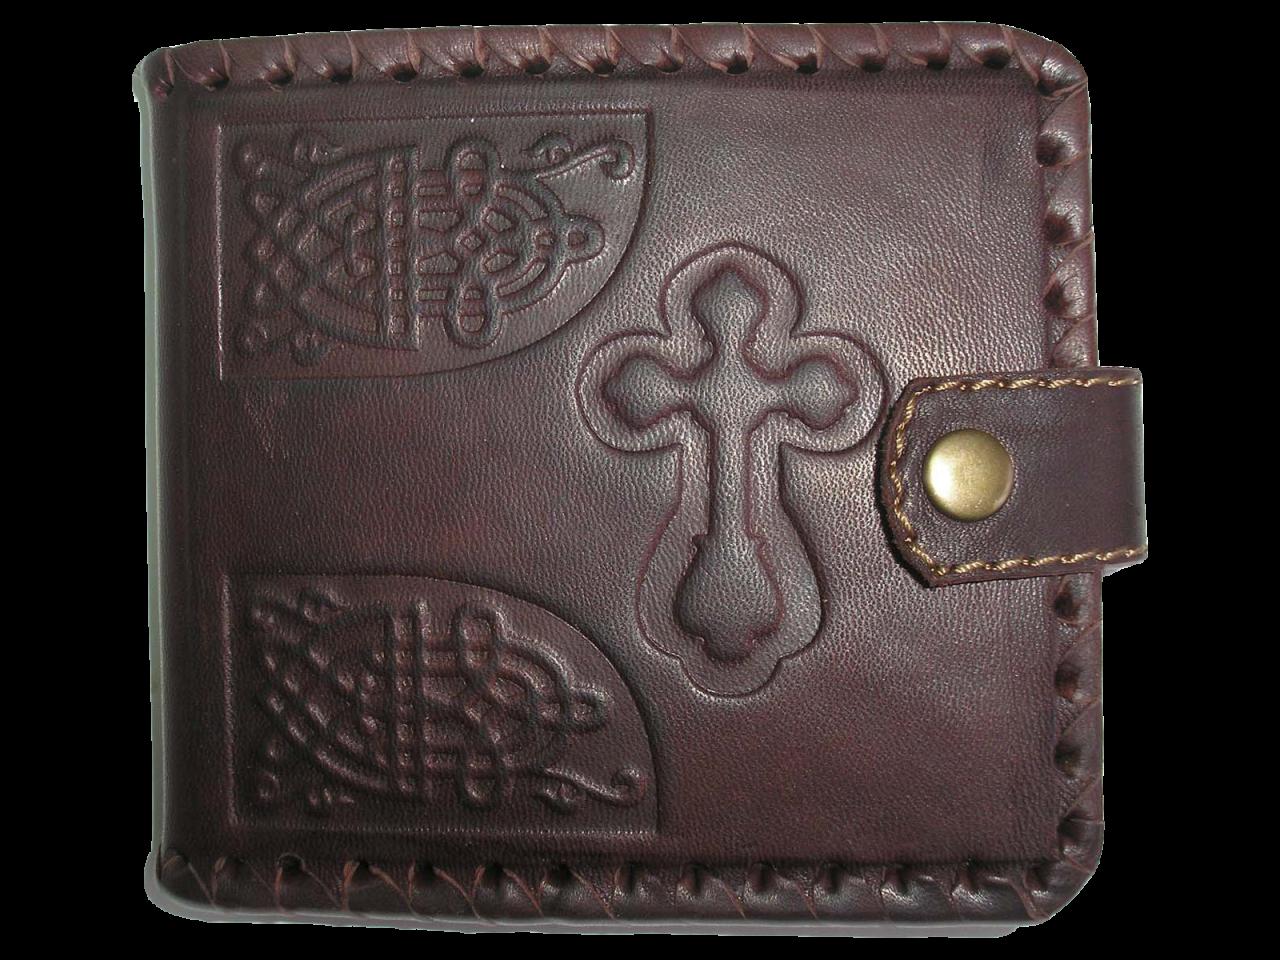 Kochelek Wallet PNG Image